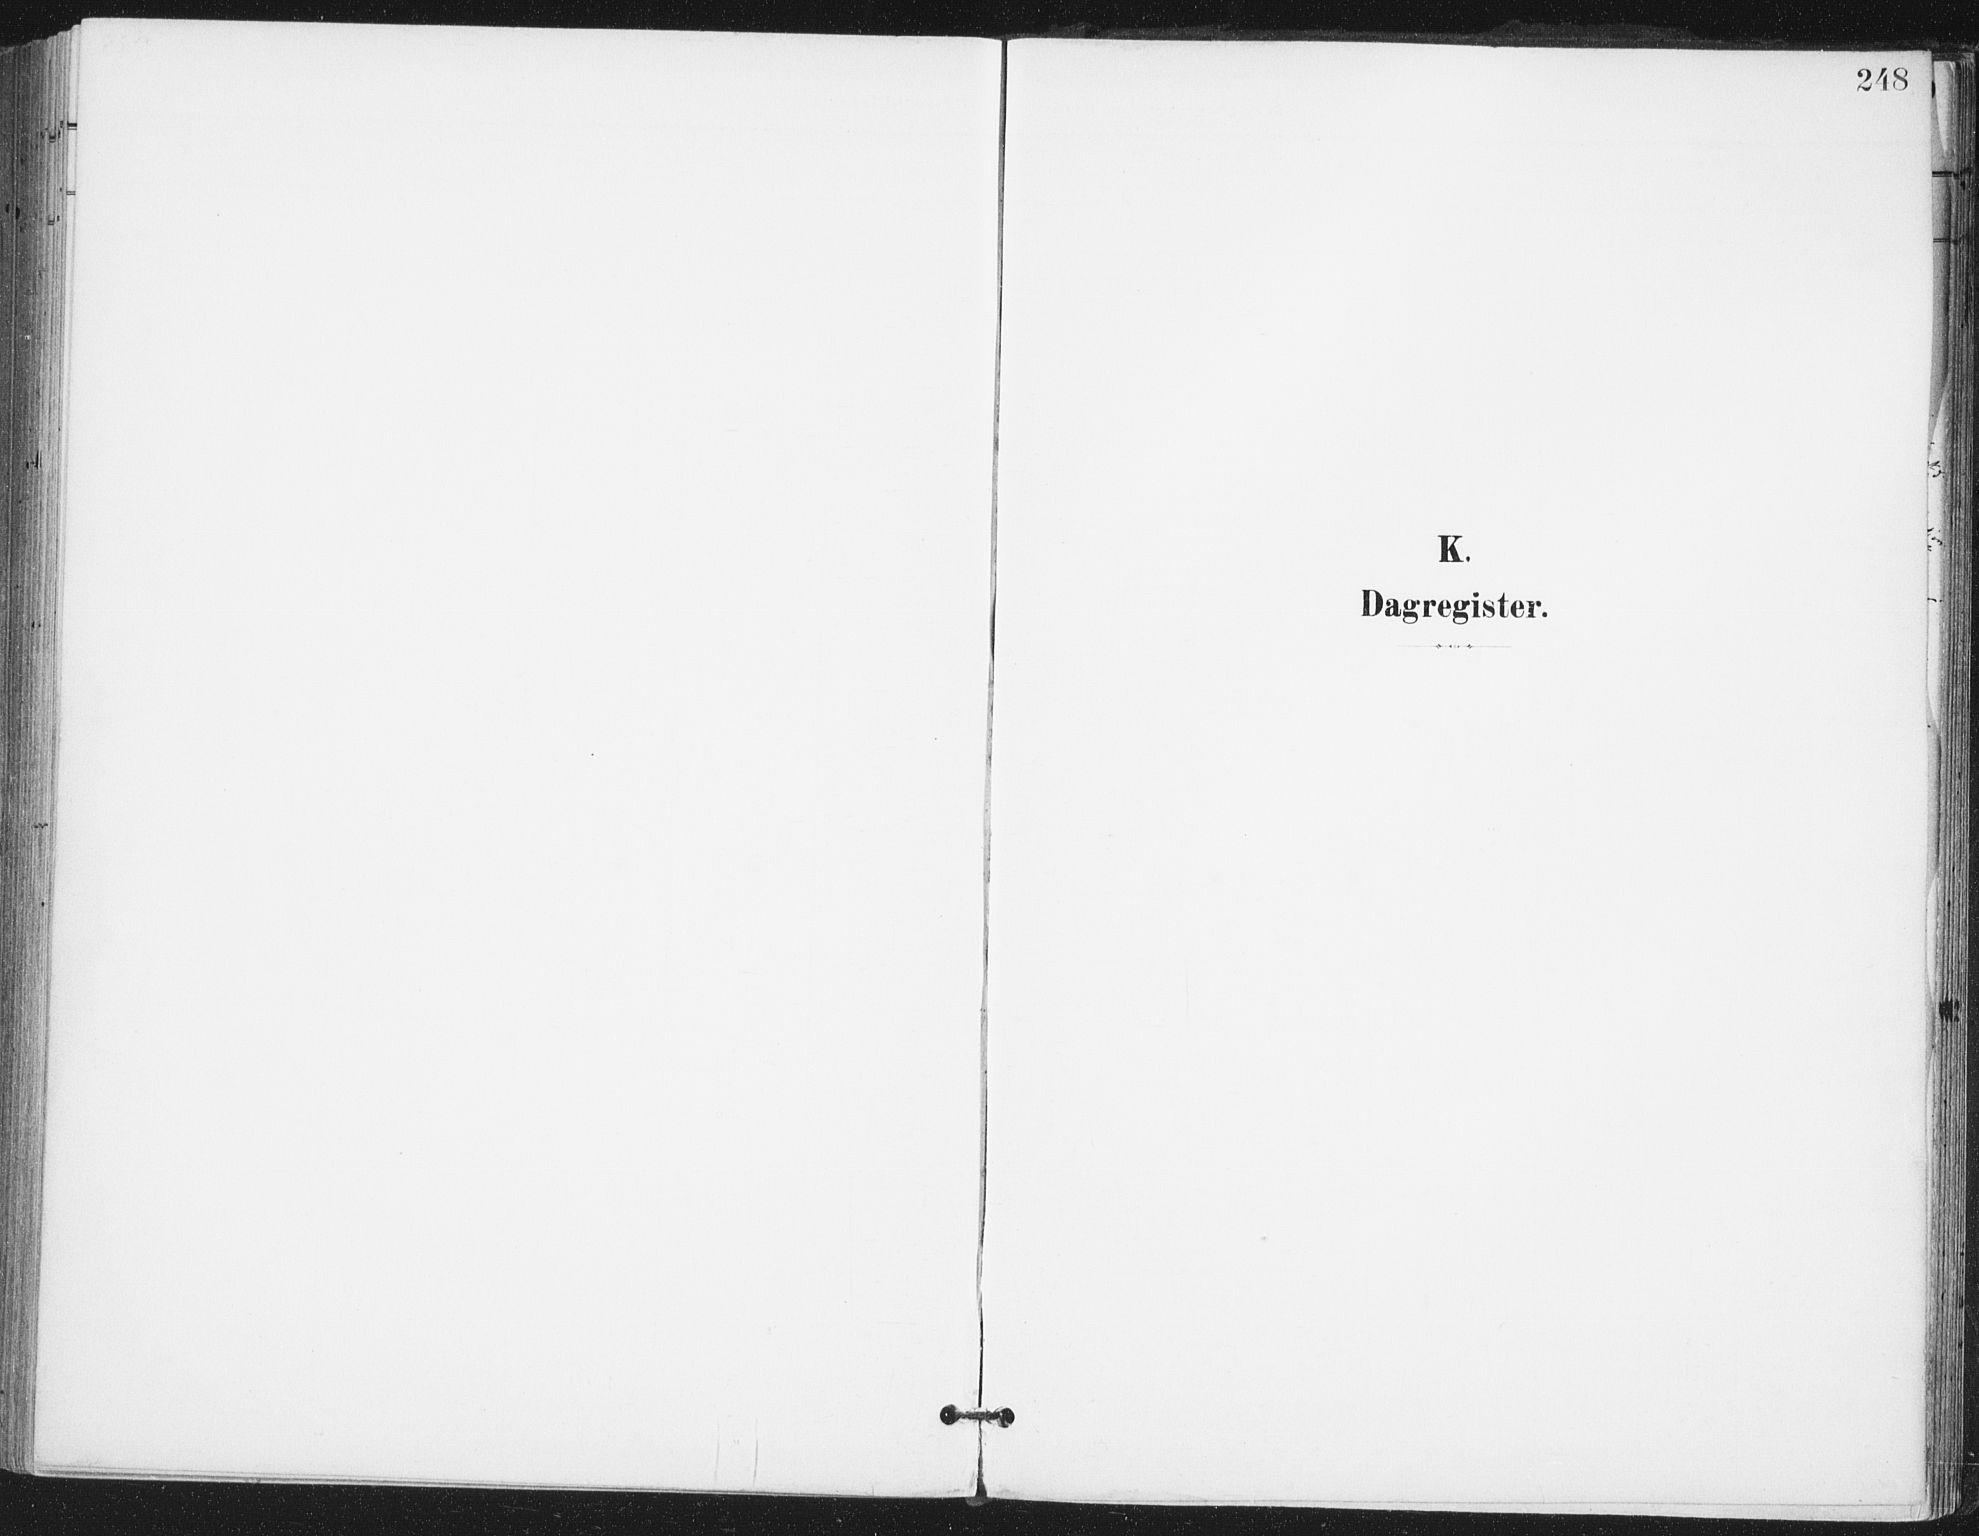 SAO, Ås prestekontor Kirkebøker, F/Fa/L0010: Ministerialbok nr. I 10, 1900-1918, s. 248